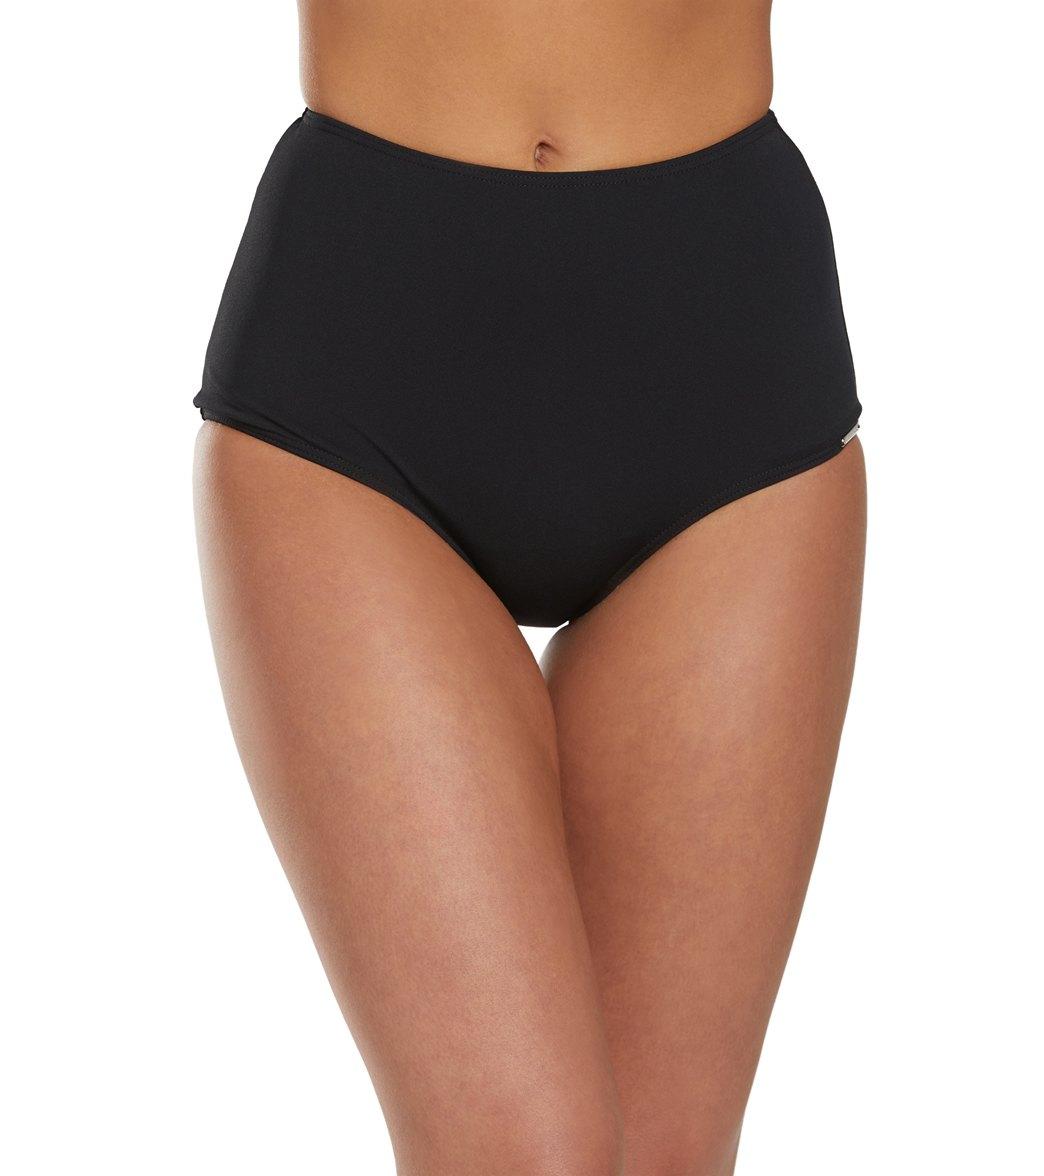 Capriosca Chlorine Resistant Solid High Waisted Bikini Bottom